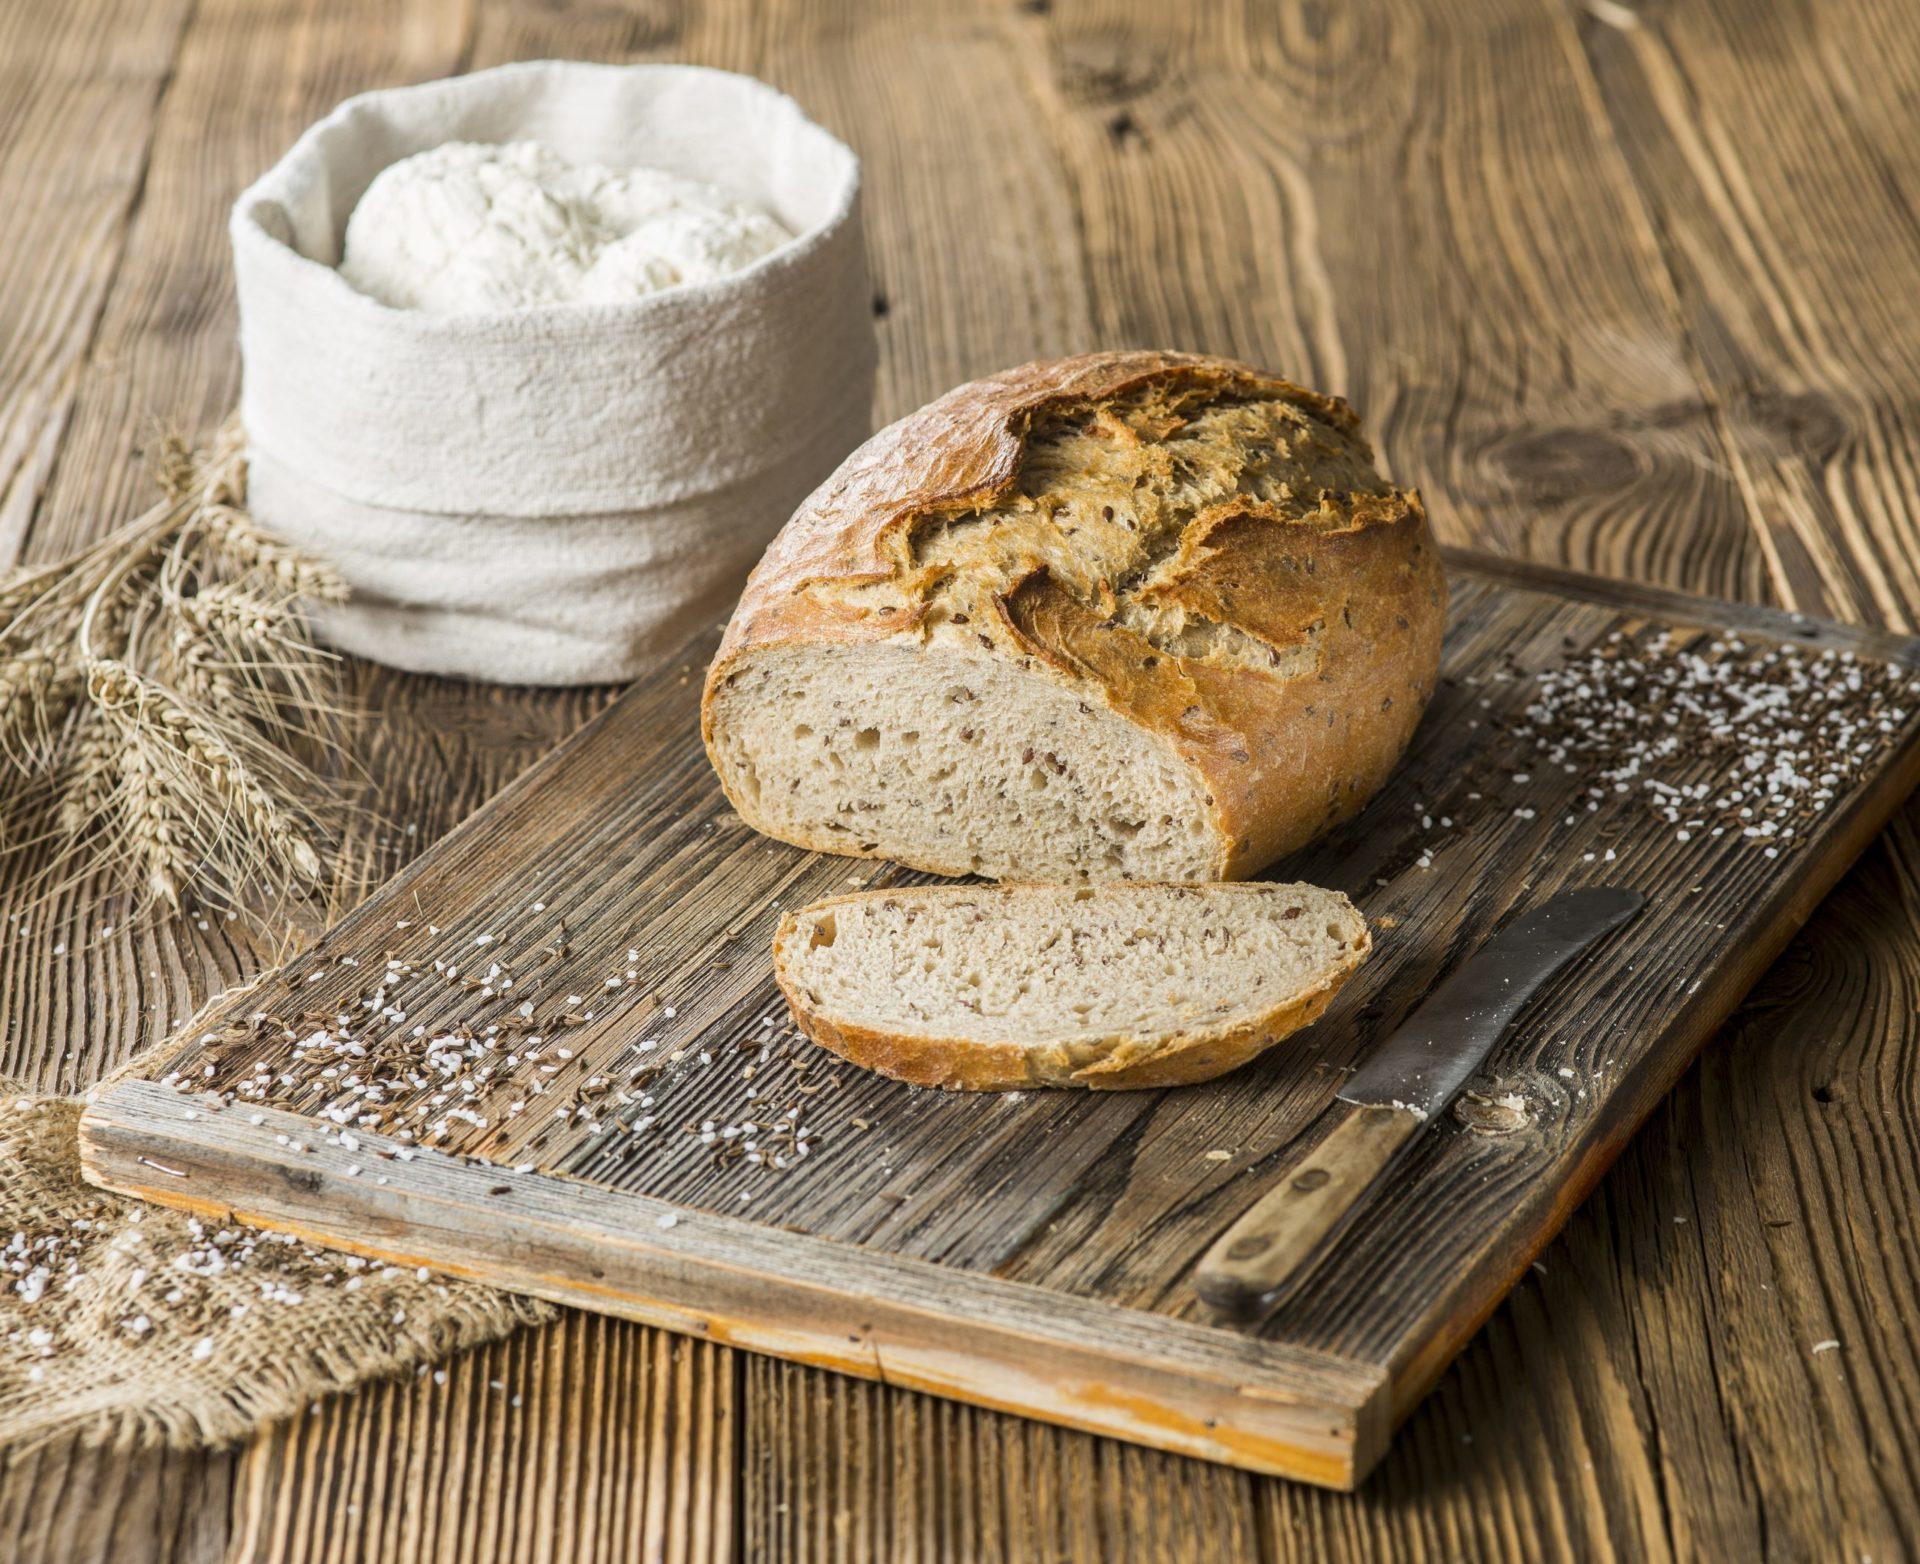 lanovy chlieb